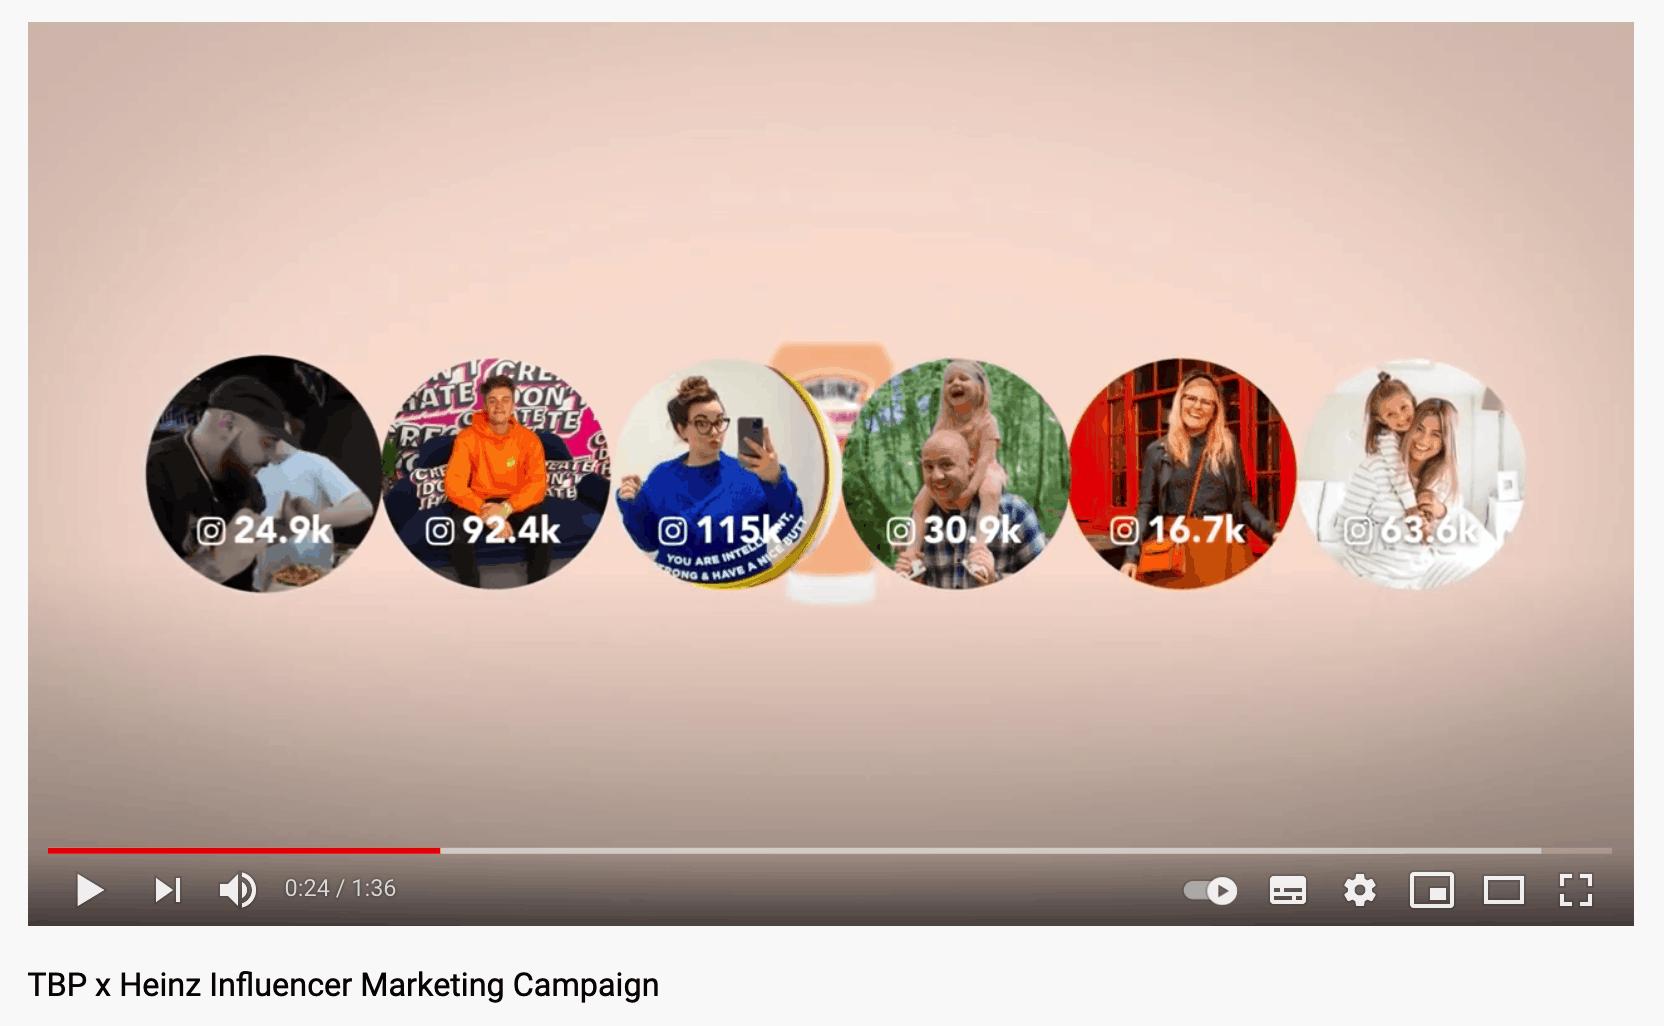 Heinz influencers YouTube screenshot